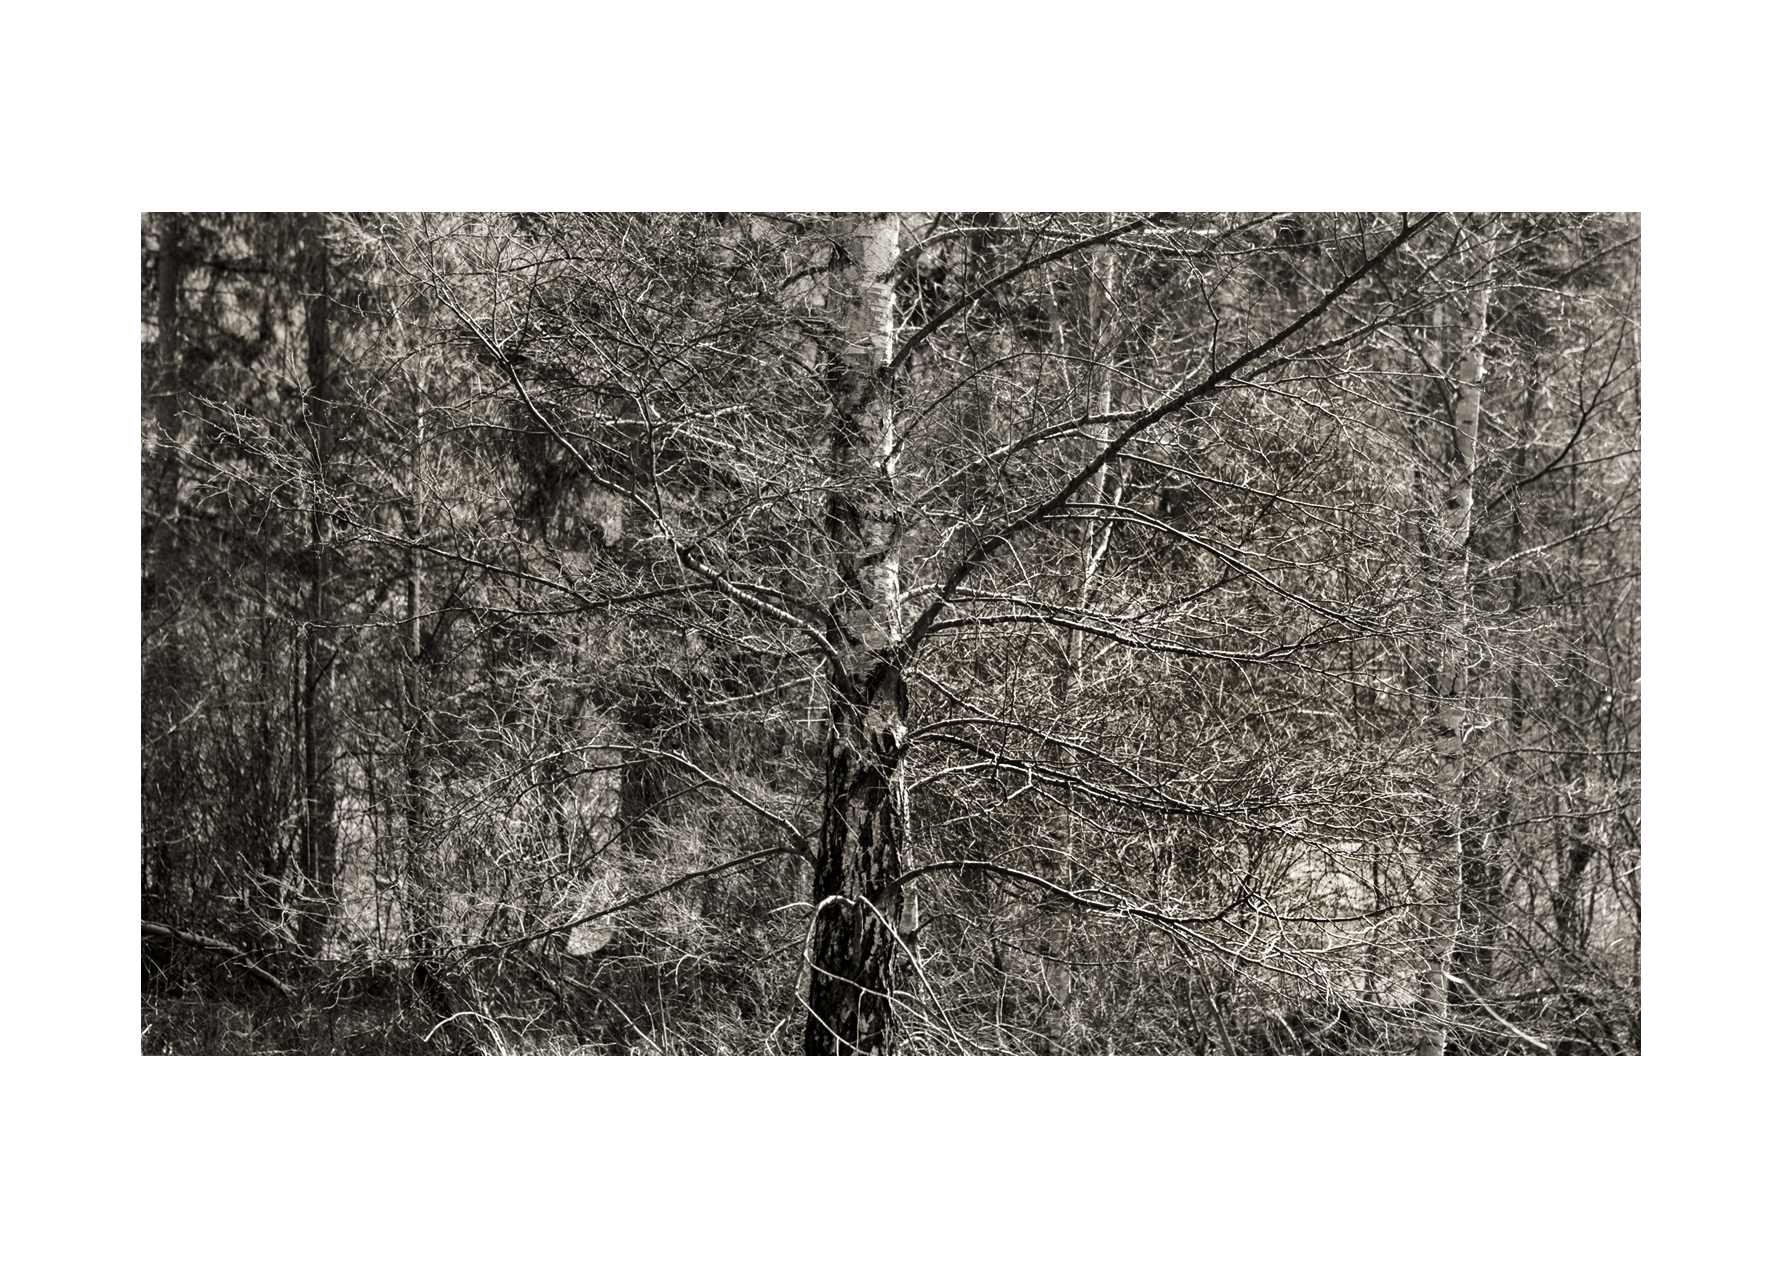 Paysage-Archétype #4 : Forêt © Stéphane Louis, IV. 18